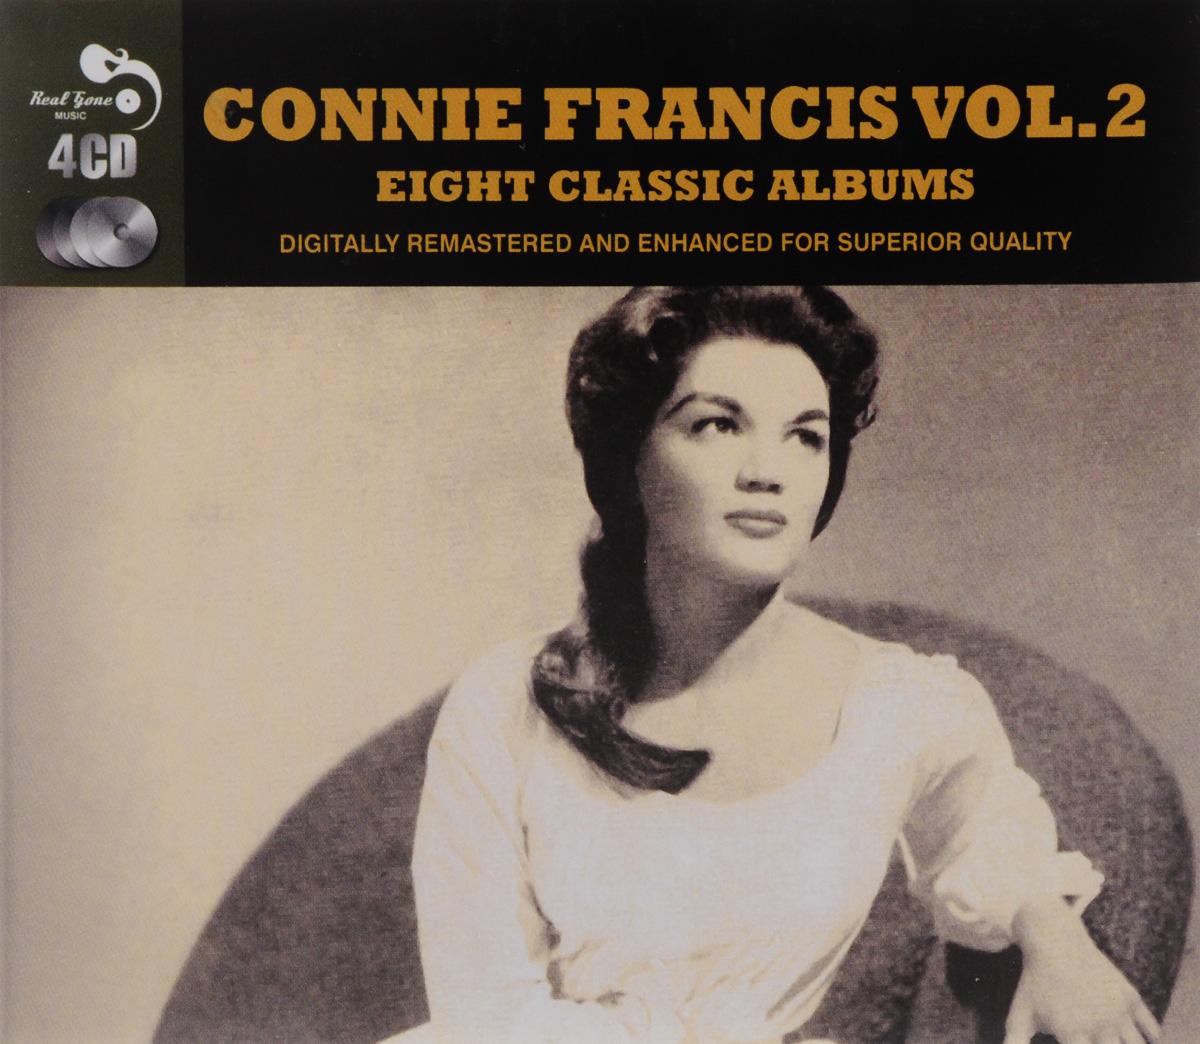 Конни Фрэнсис Connie Francis. 8 Classic Albums Volume 2 (4 CD) roxy music roxy music the studio albums limited edition 8 lp